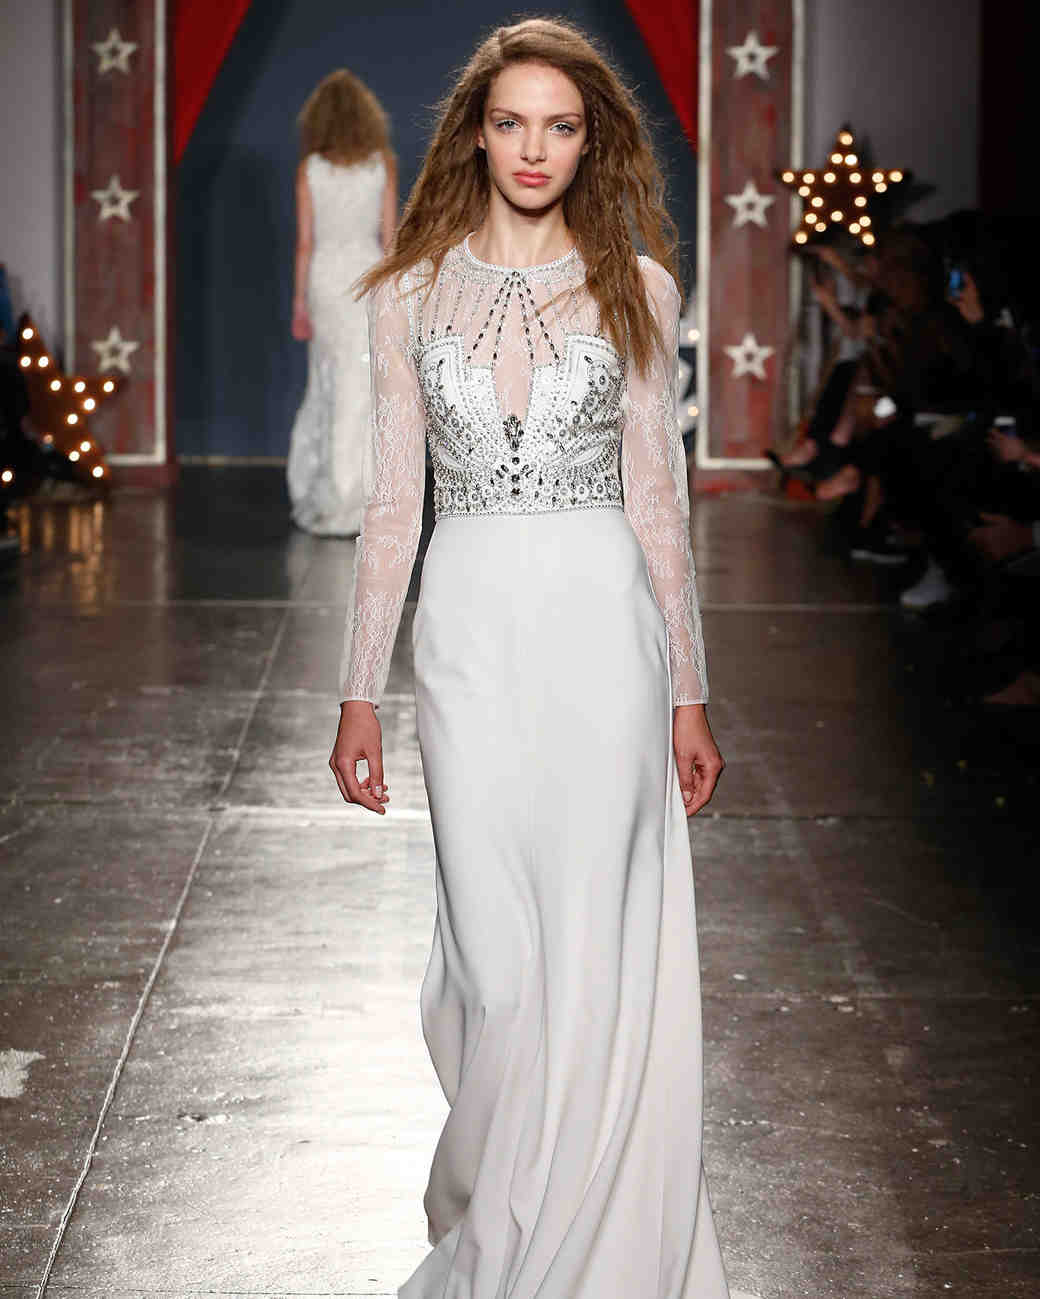 jenny packham wedding dress spring 2018 high neck embellished long sleeves